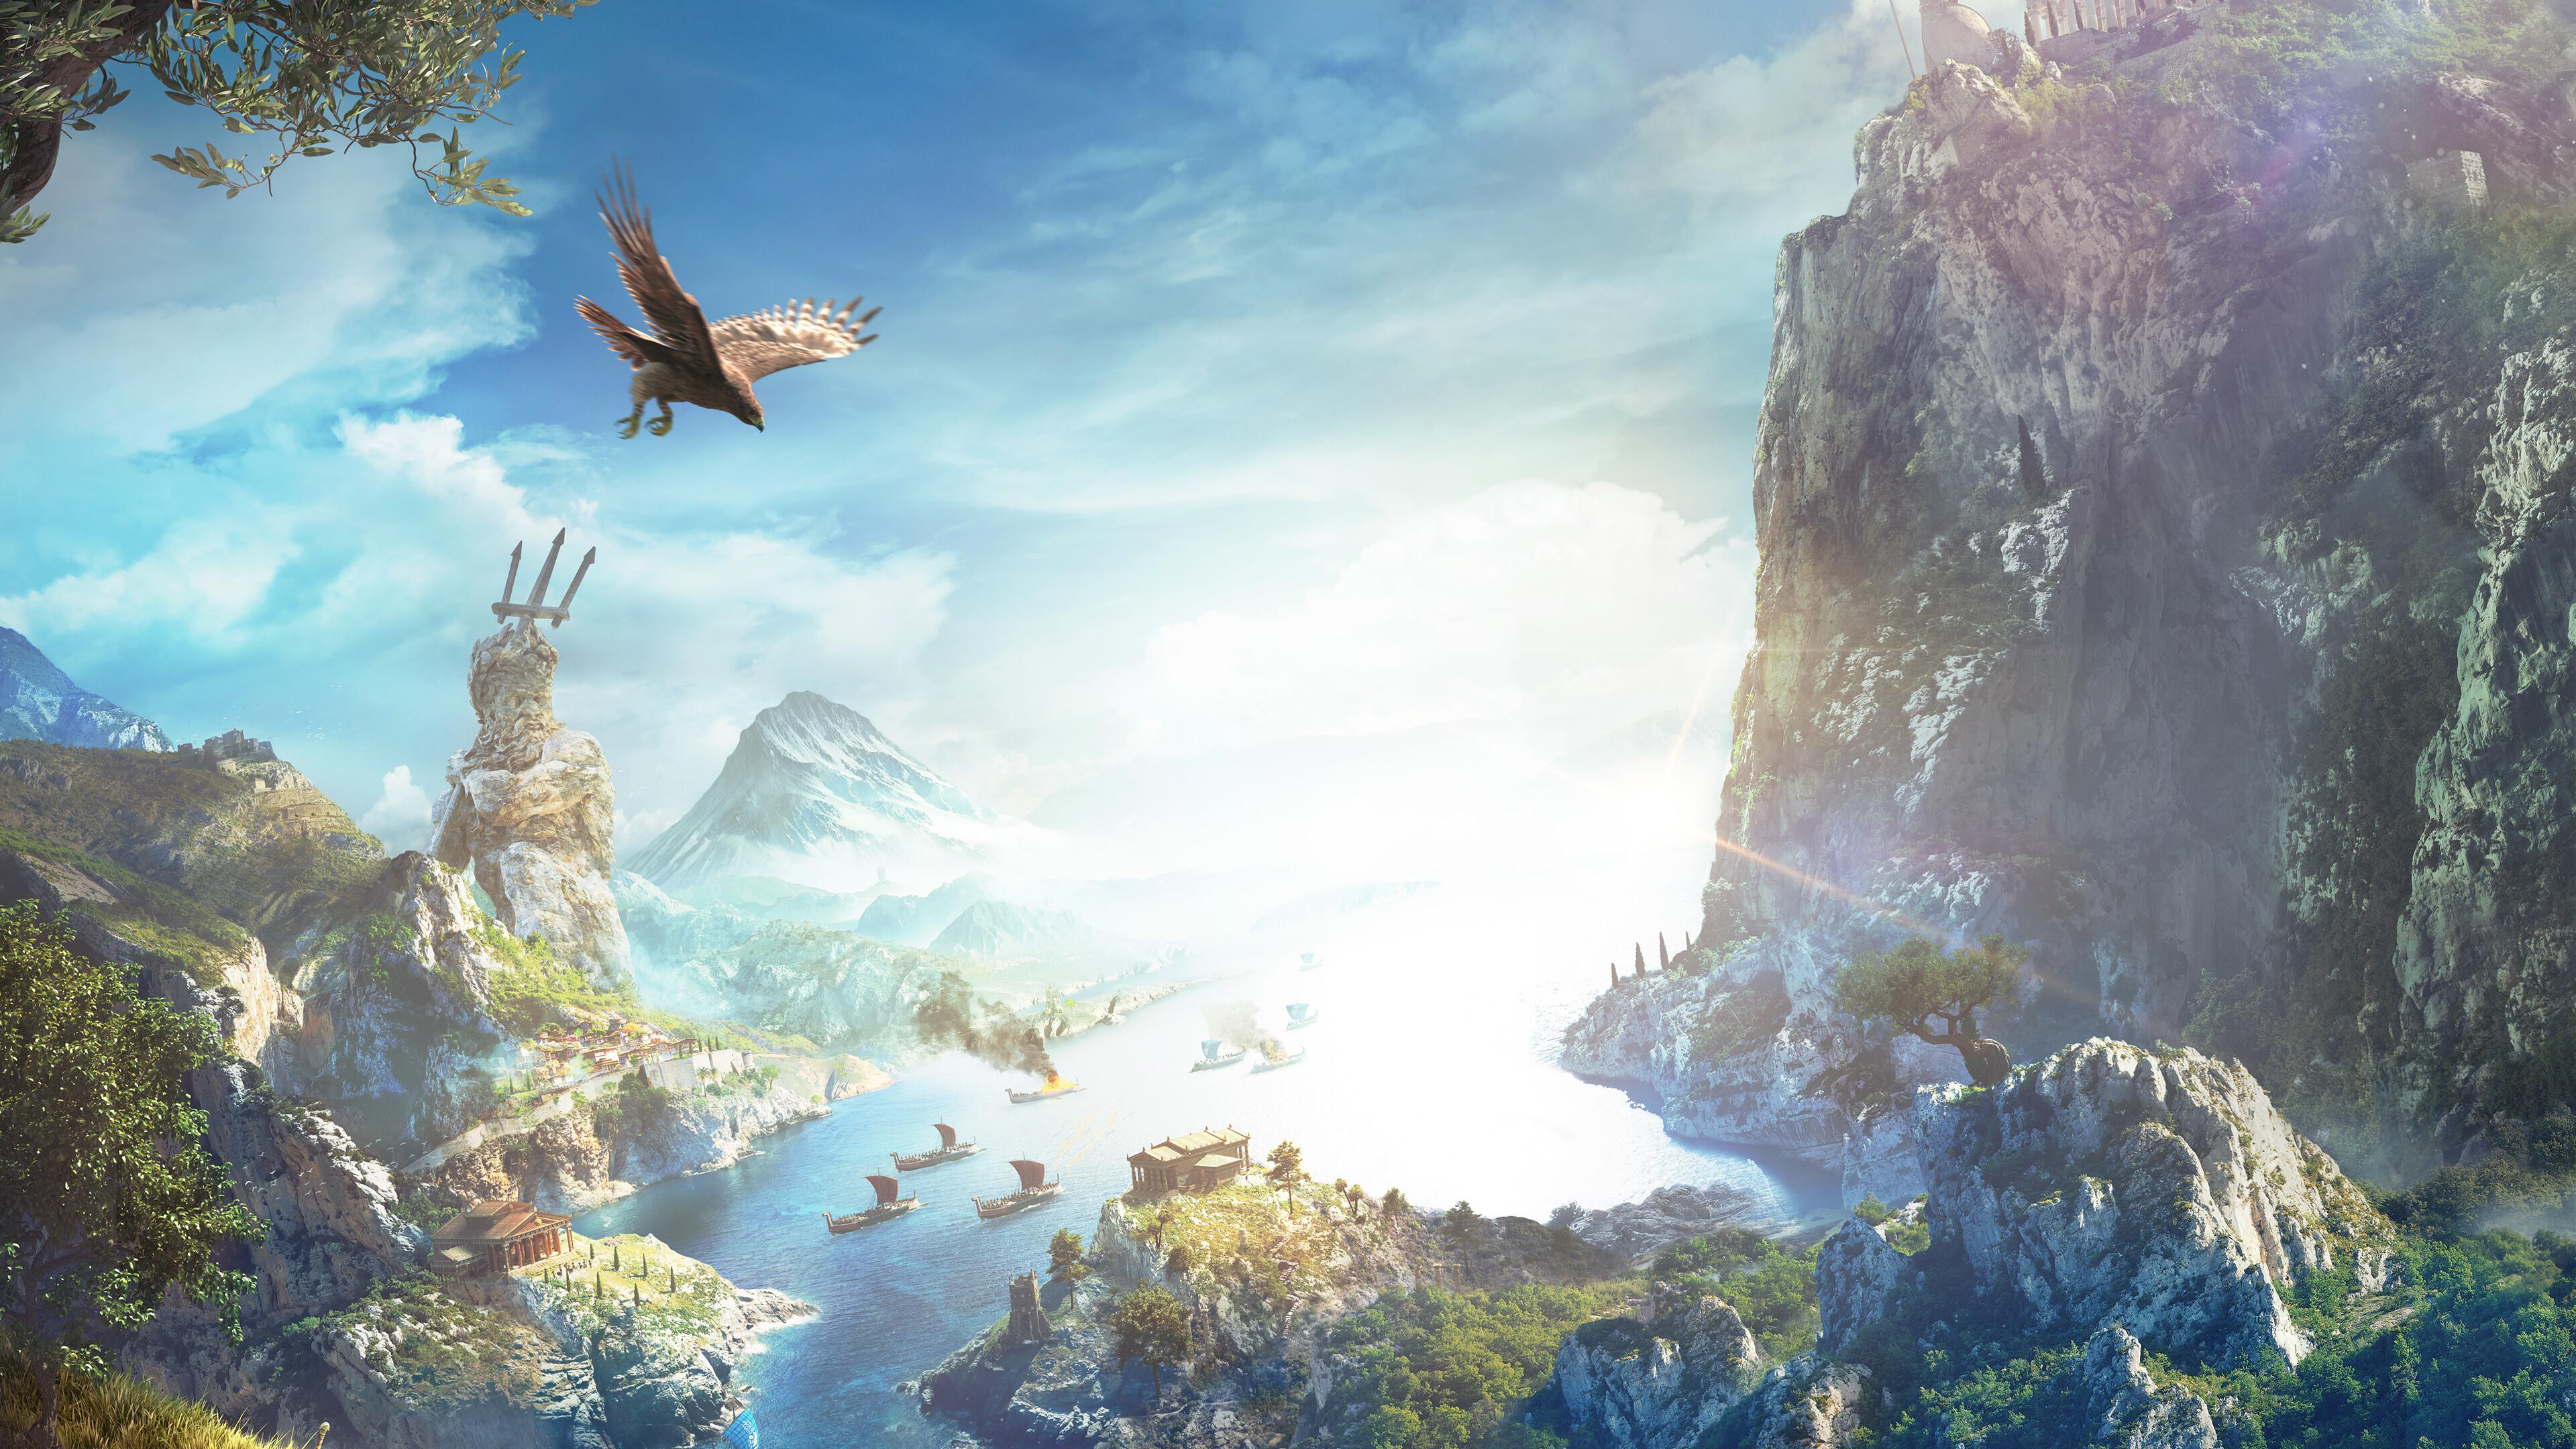 3840x2160 Assassins Creed Odyssey Nature Background Key Art 4k 4k Hd